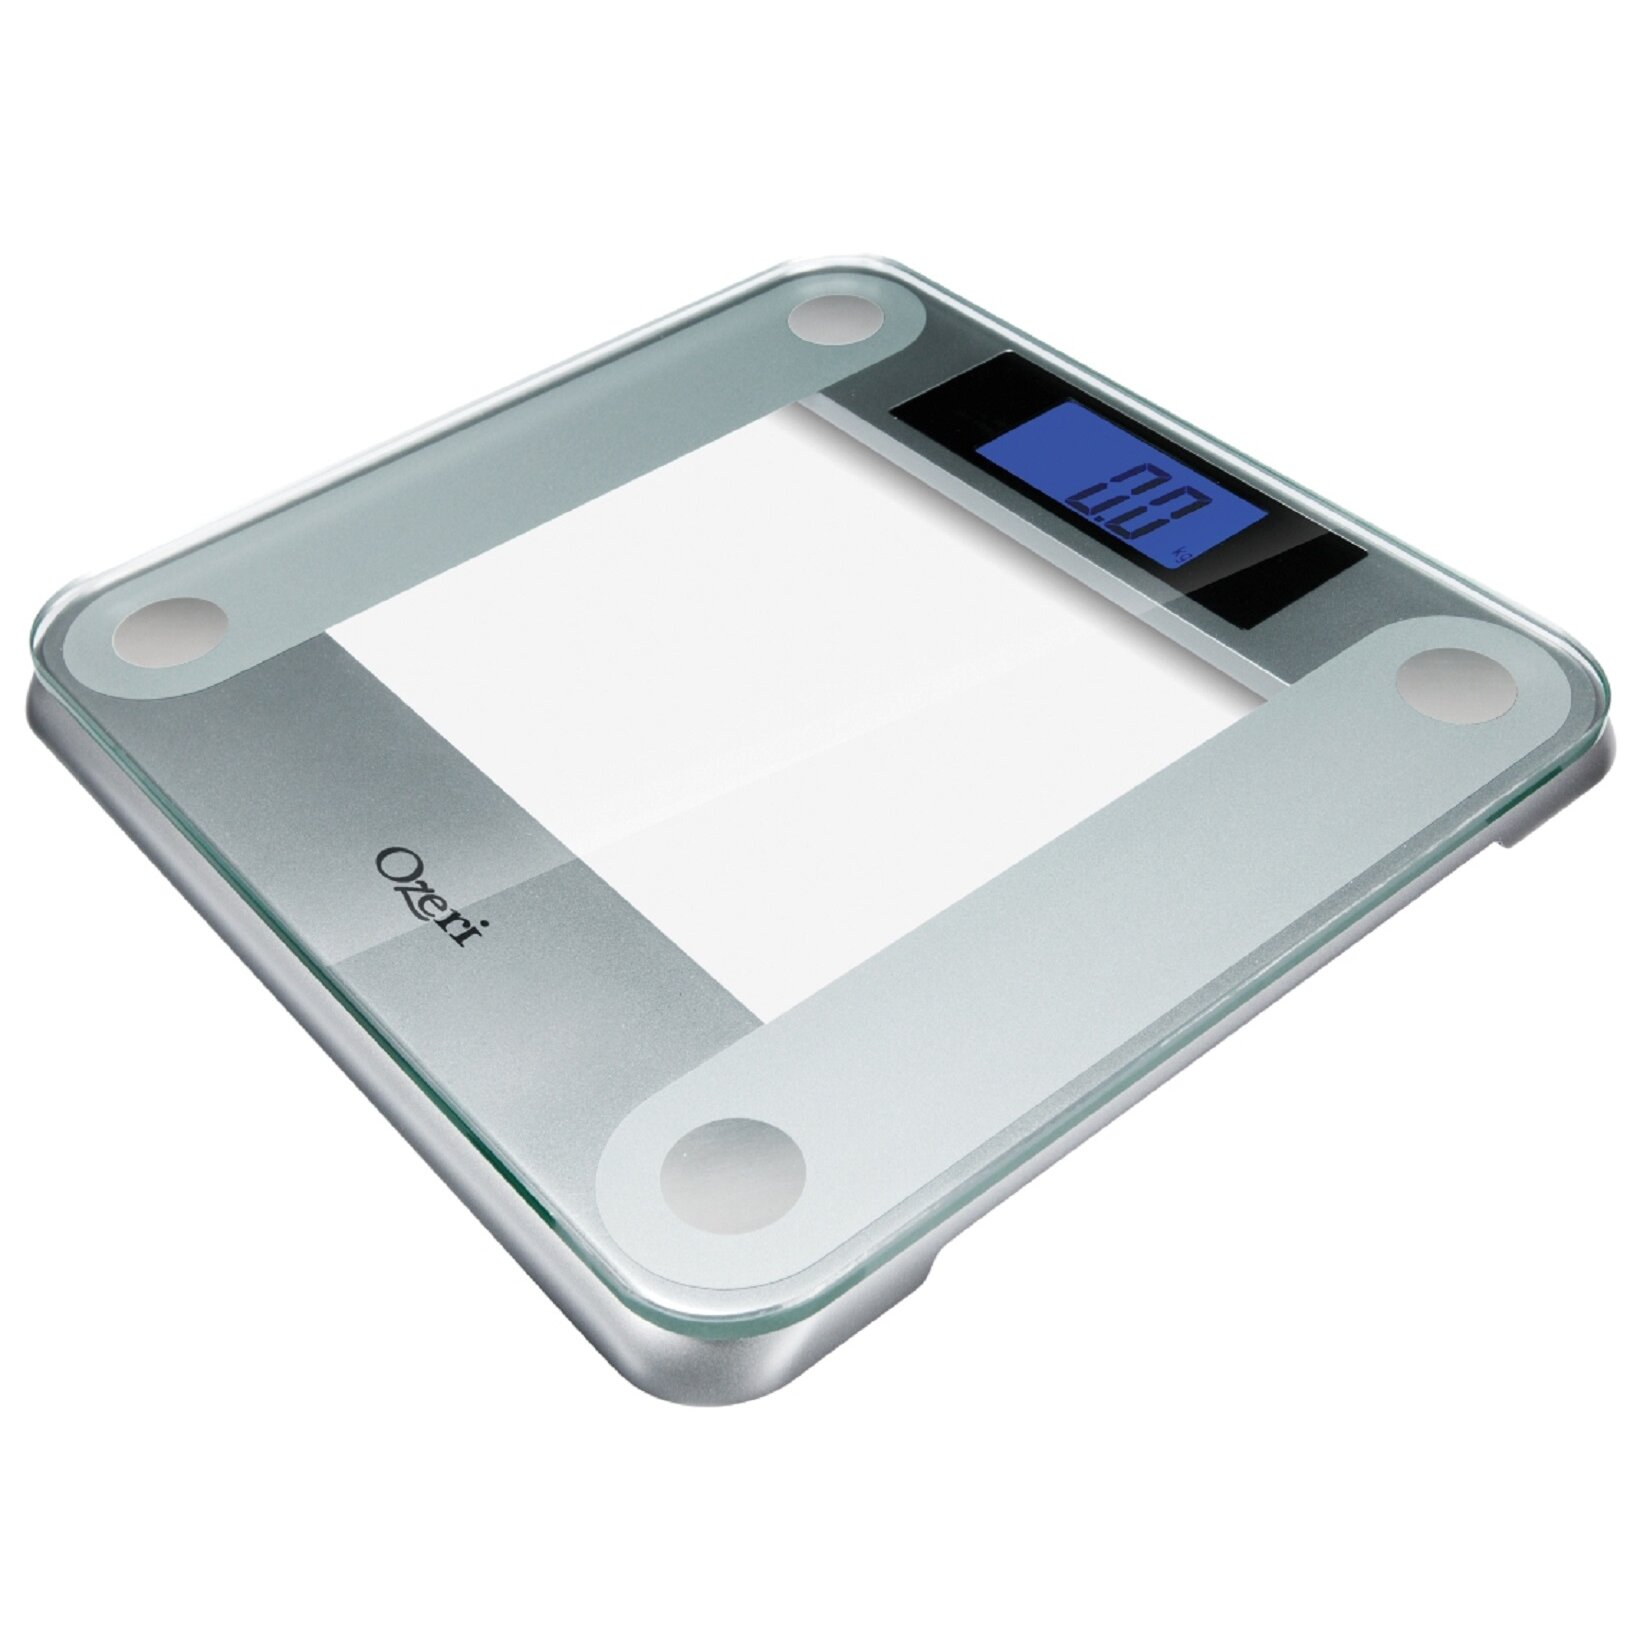 Digital Bathroom Scales For Sale: Ozeri Precision II Digital Bathroom Scale (440 Lbs